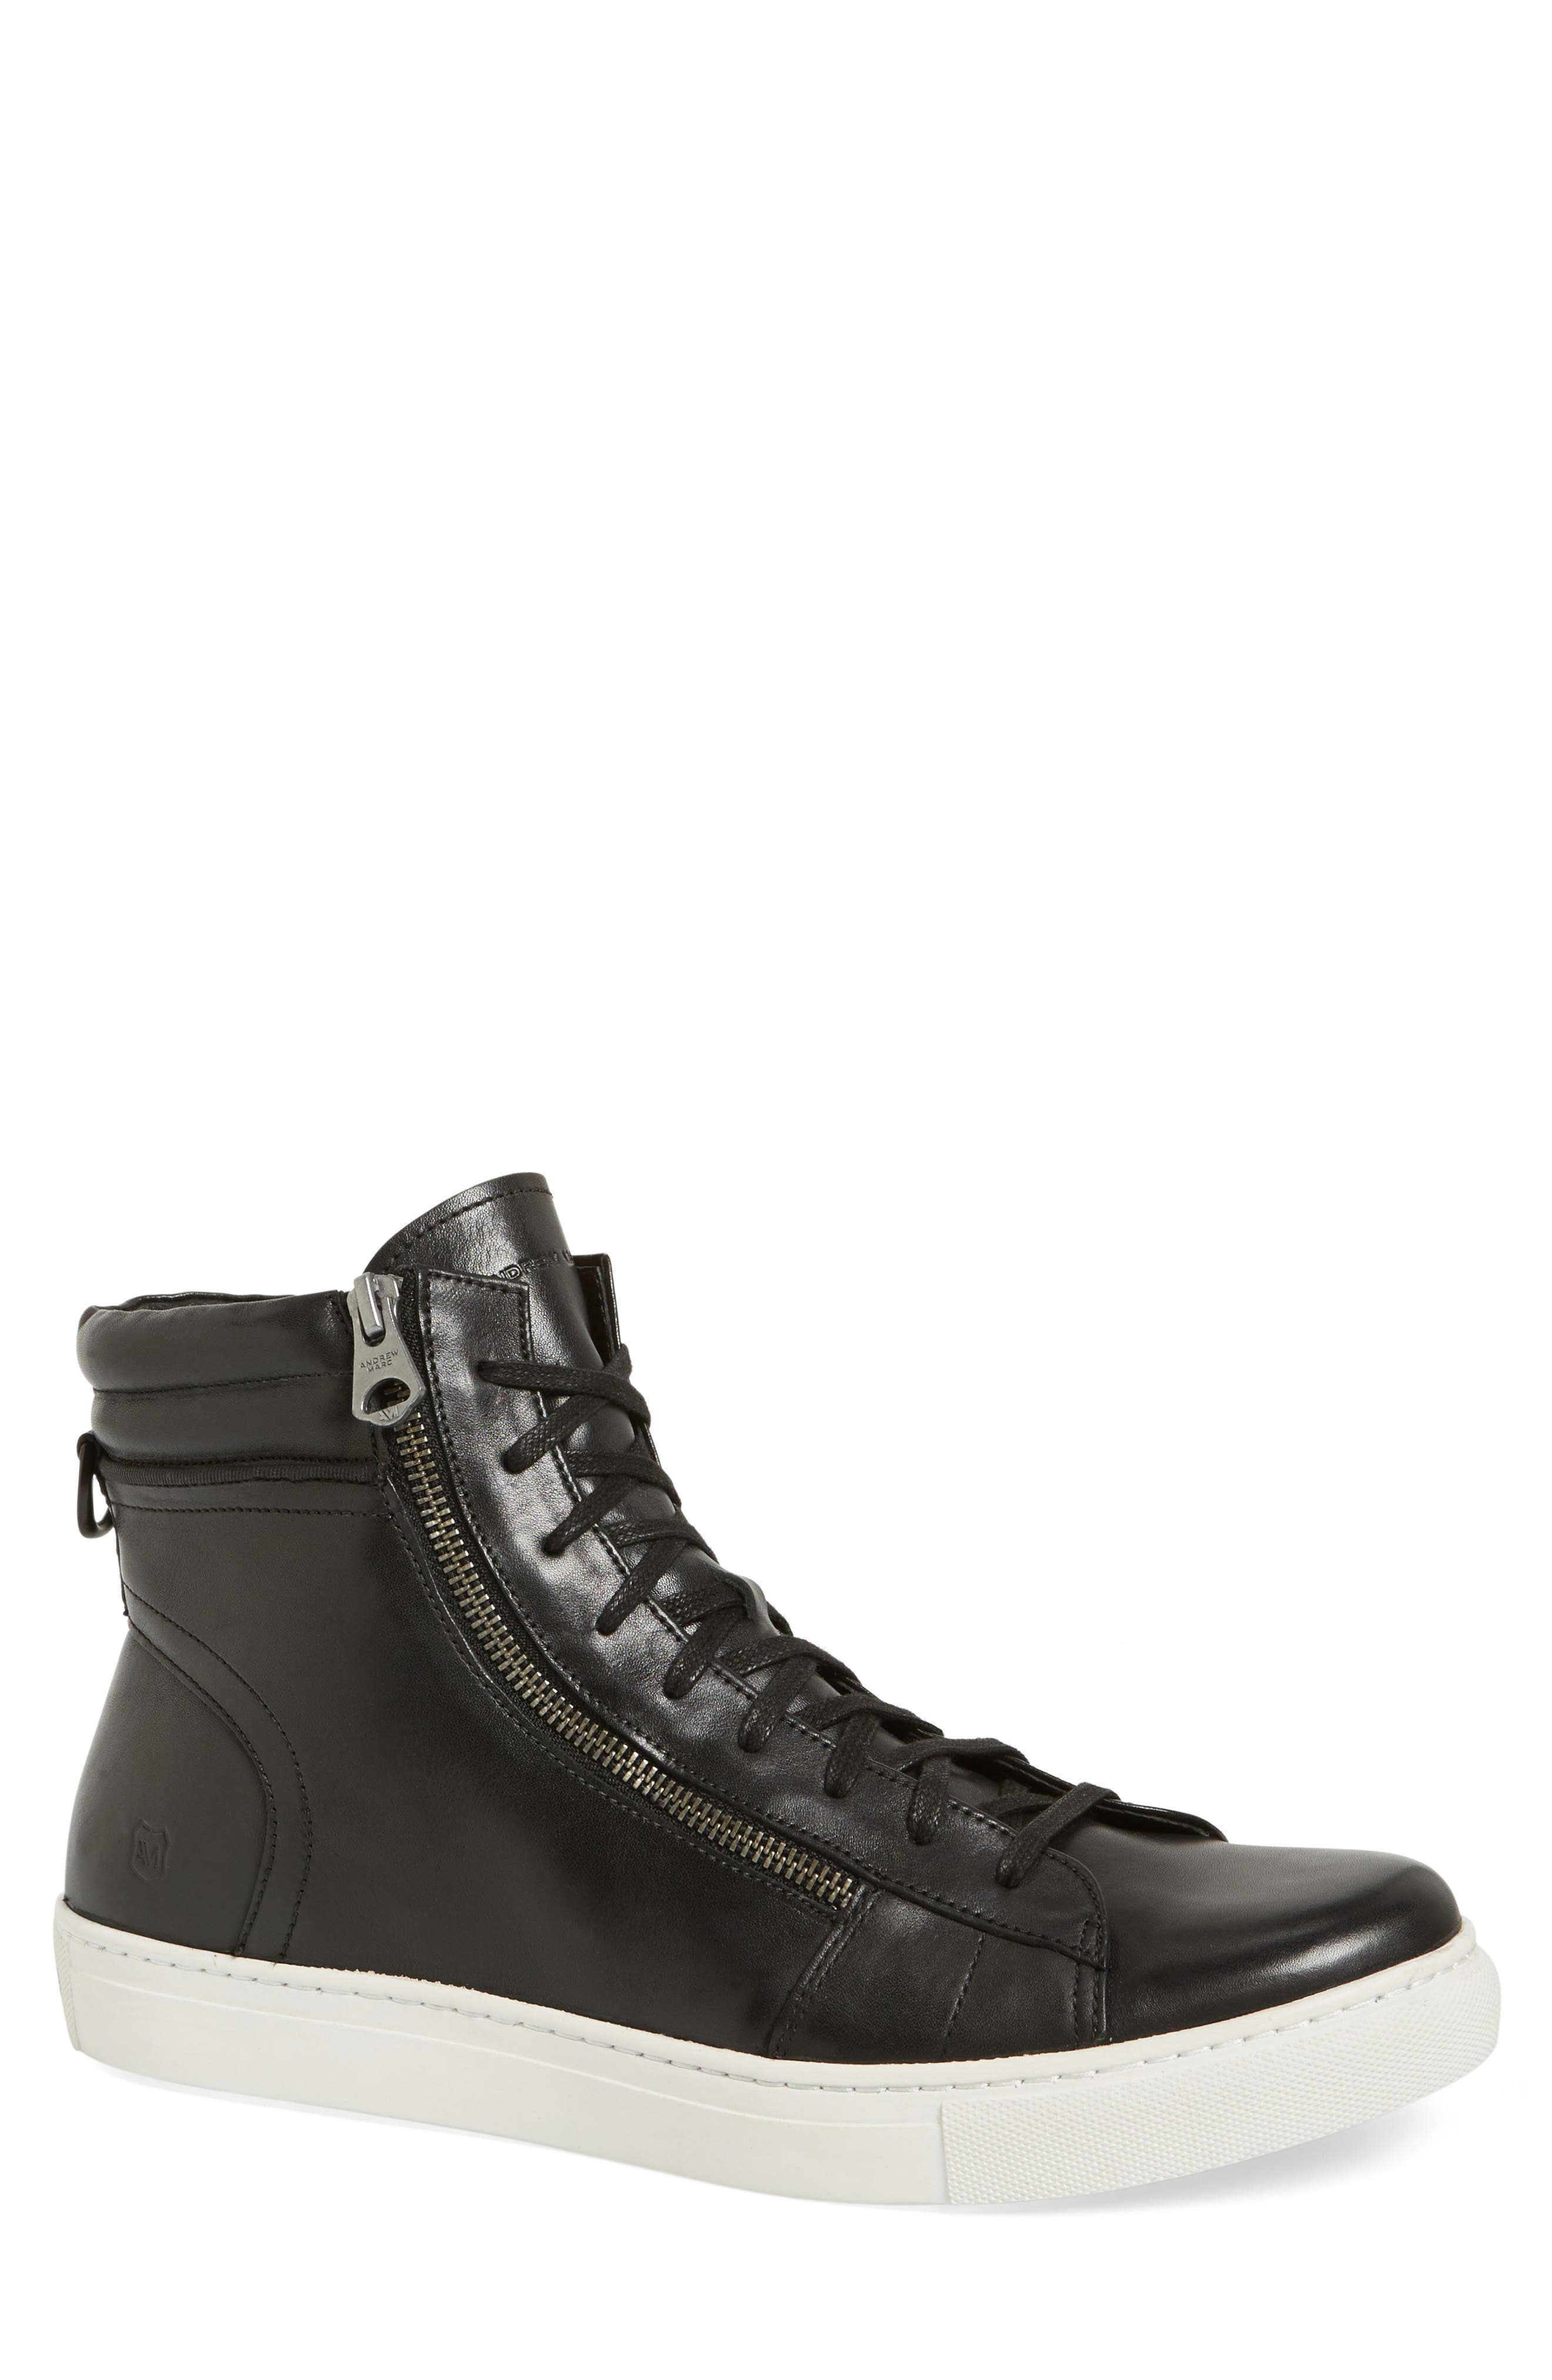 Remsen Sneaker,                             Alternate thumbnail 3, color,                             Black/ White Leather